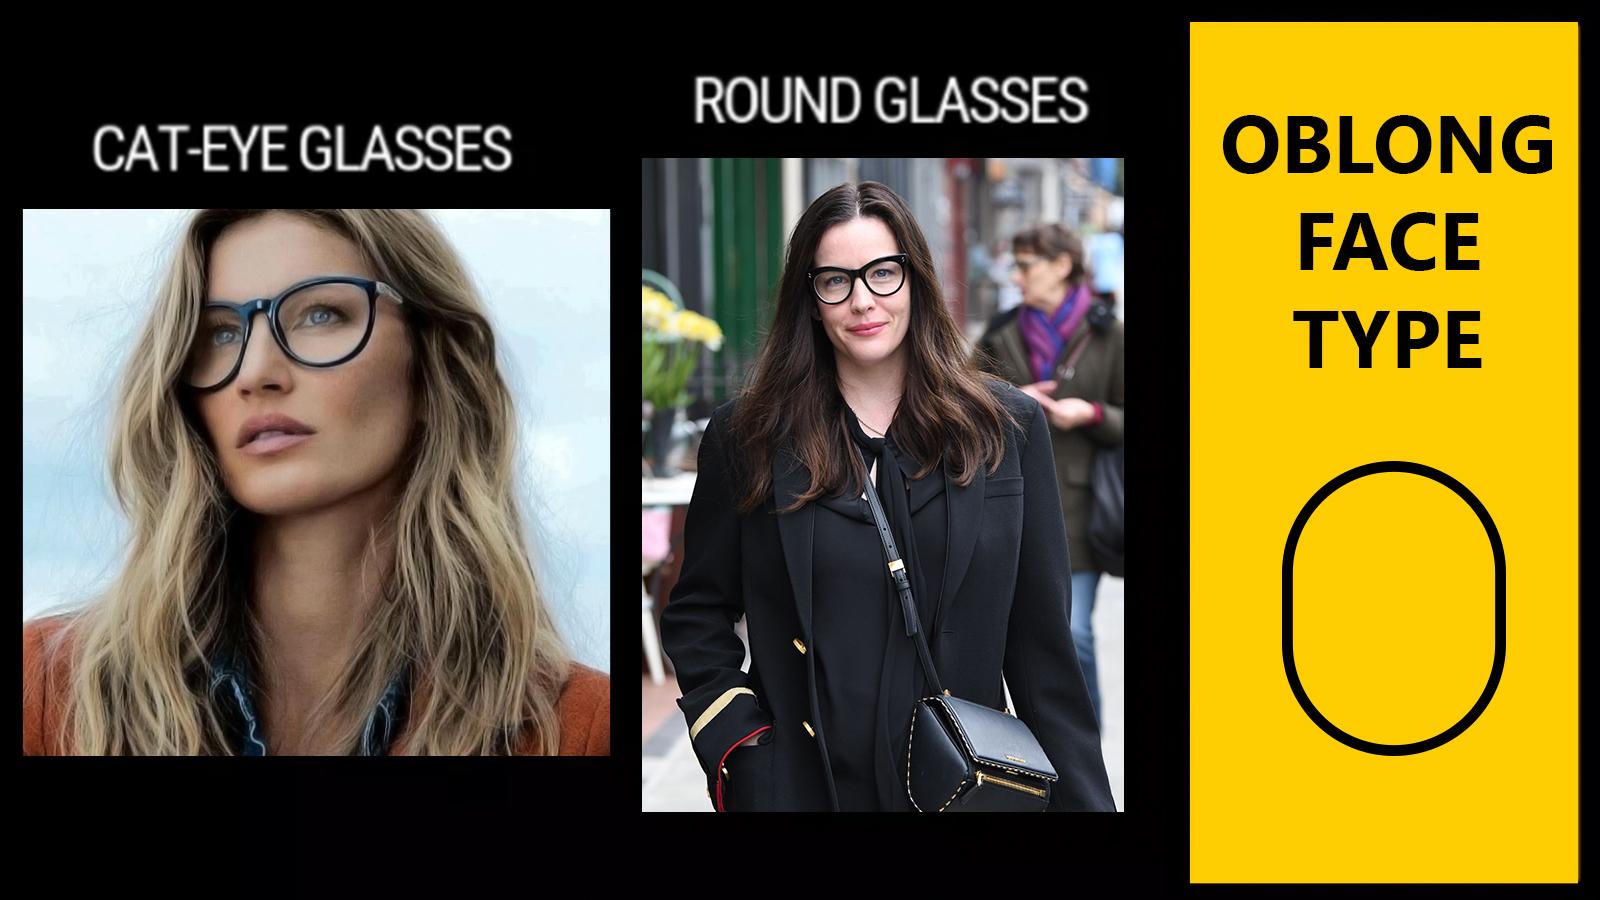 Celebrities with oblong faces: Liv Tyler, Gisele Bundchen: